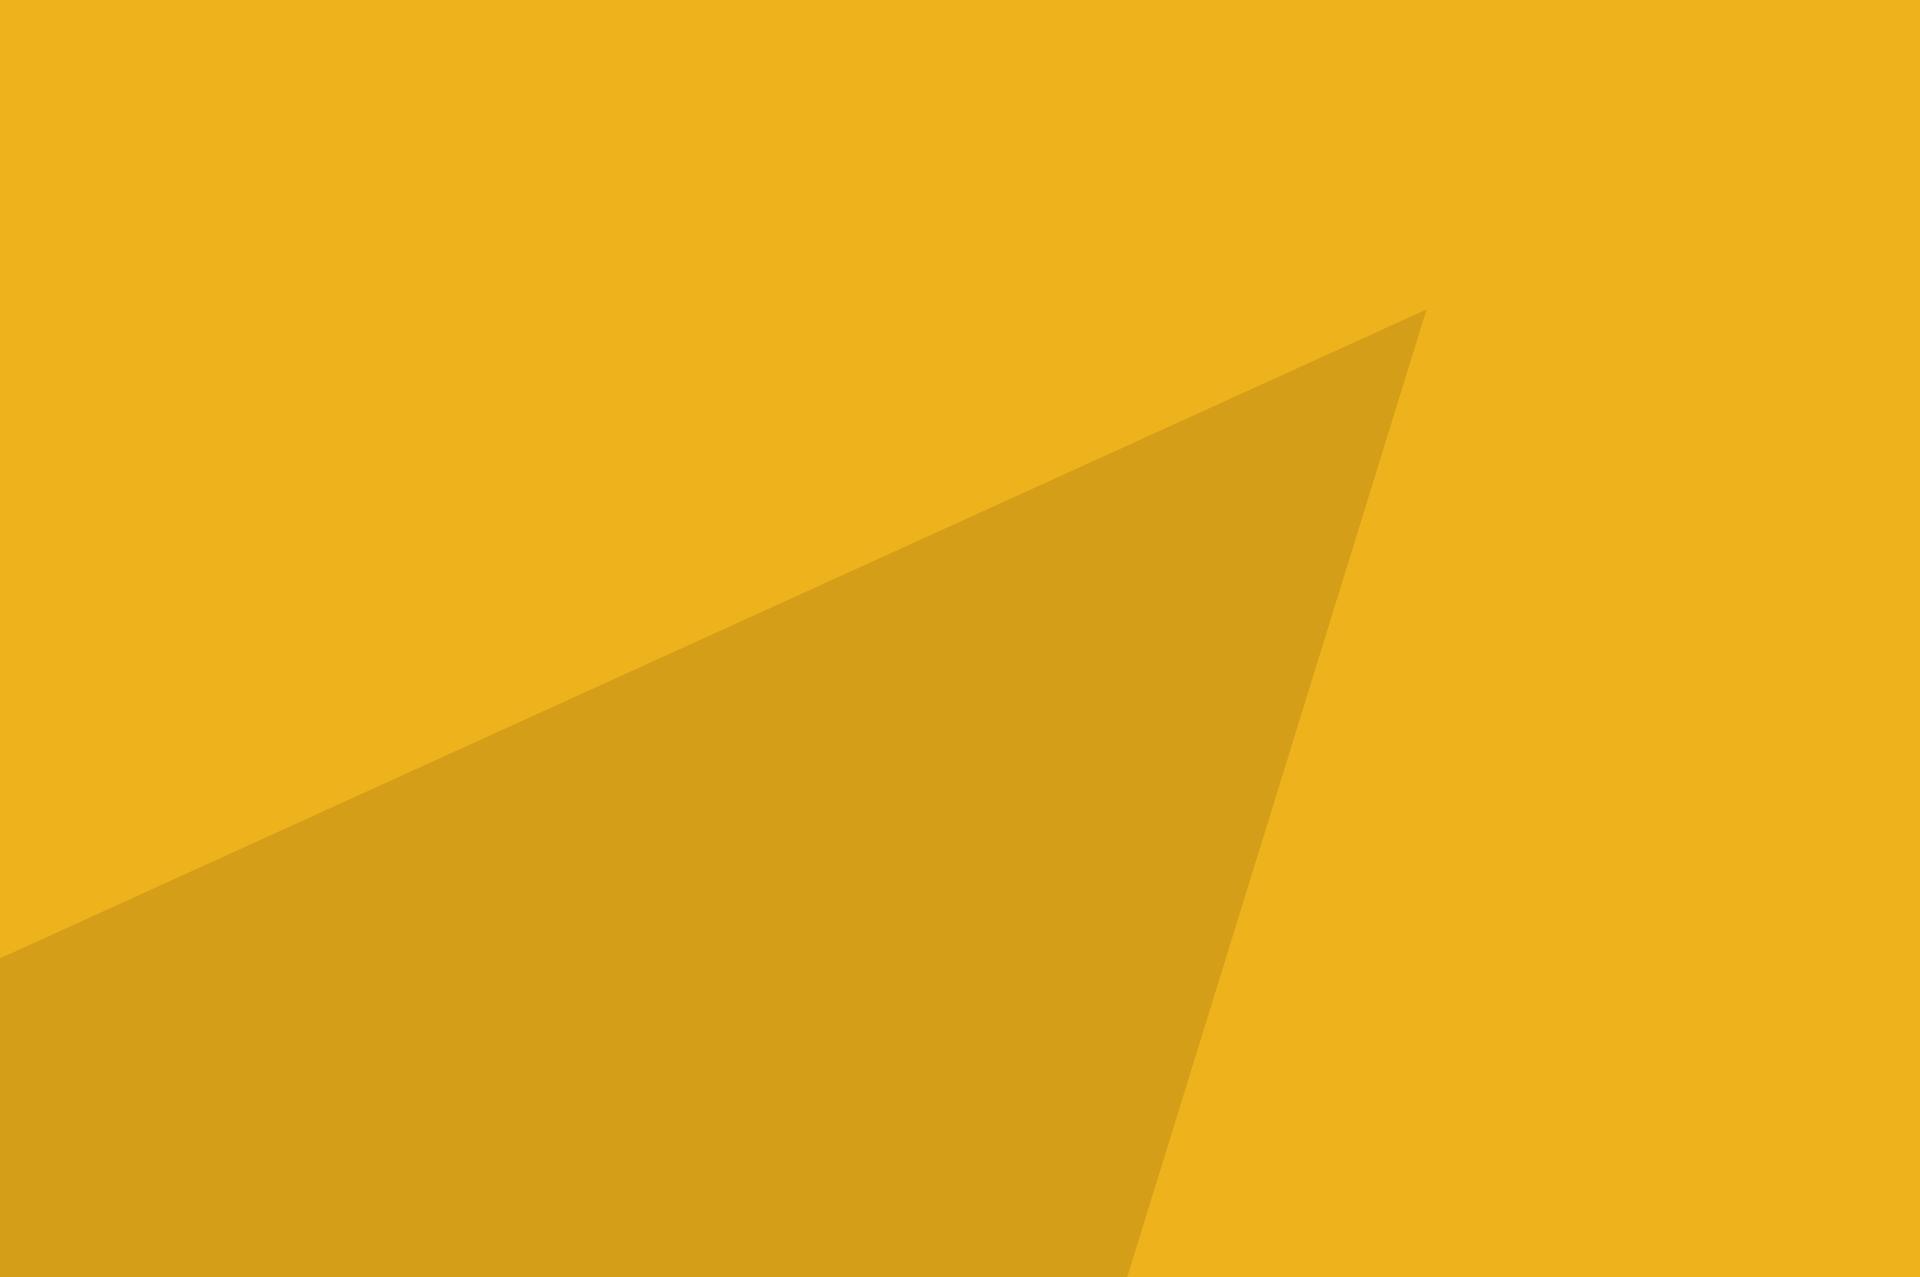 yellowbg6